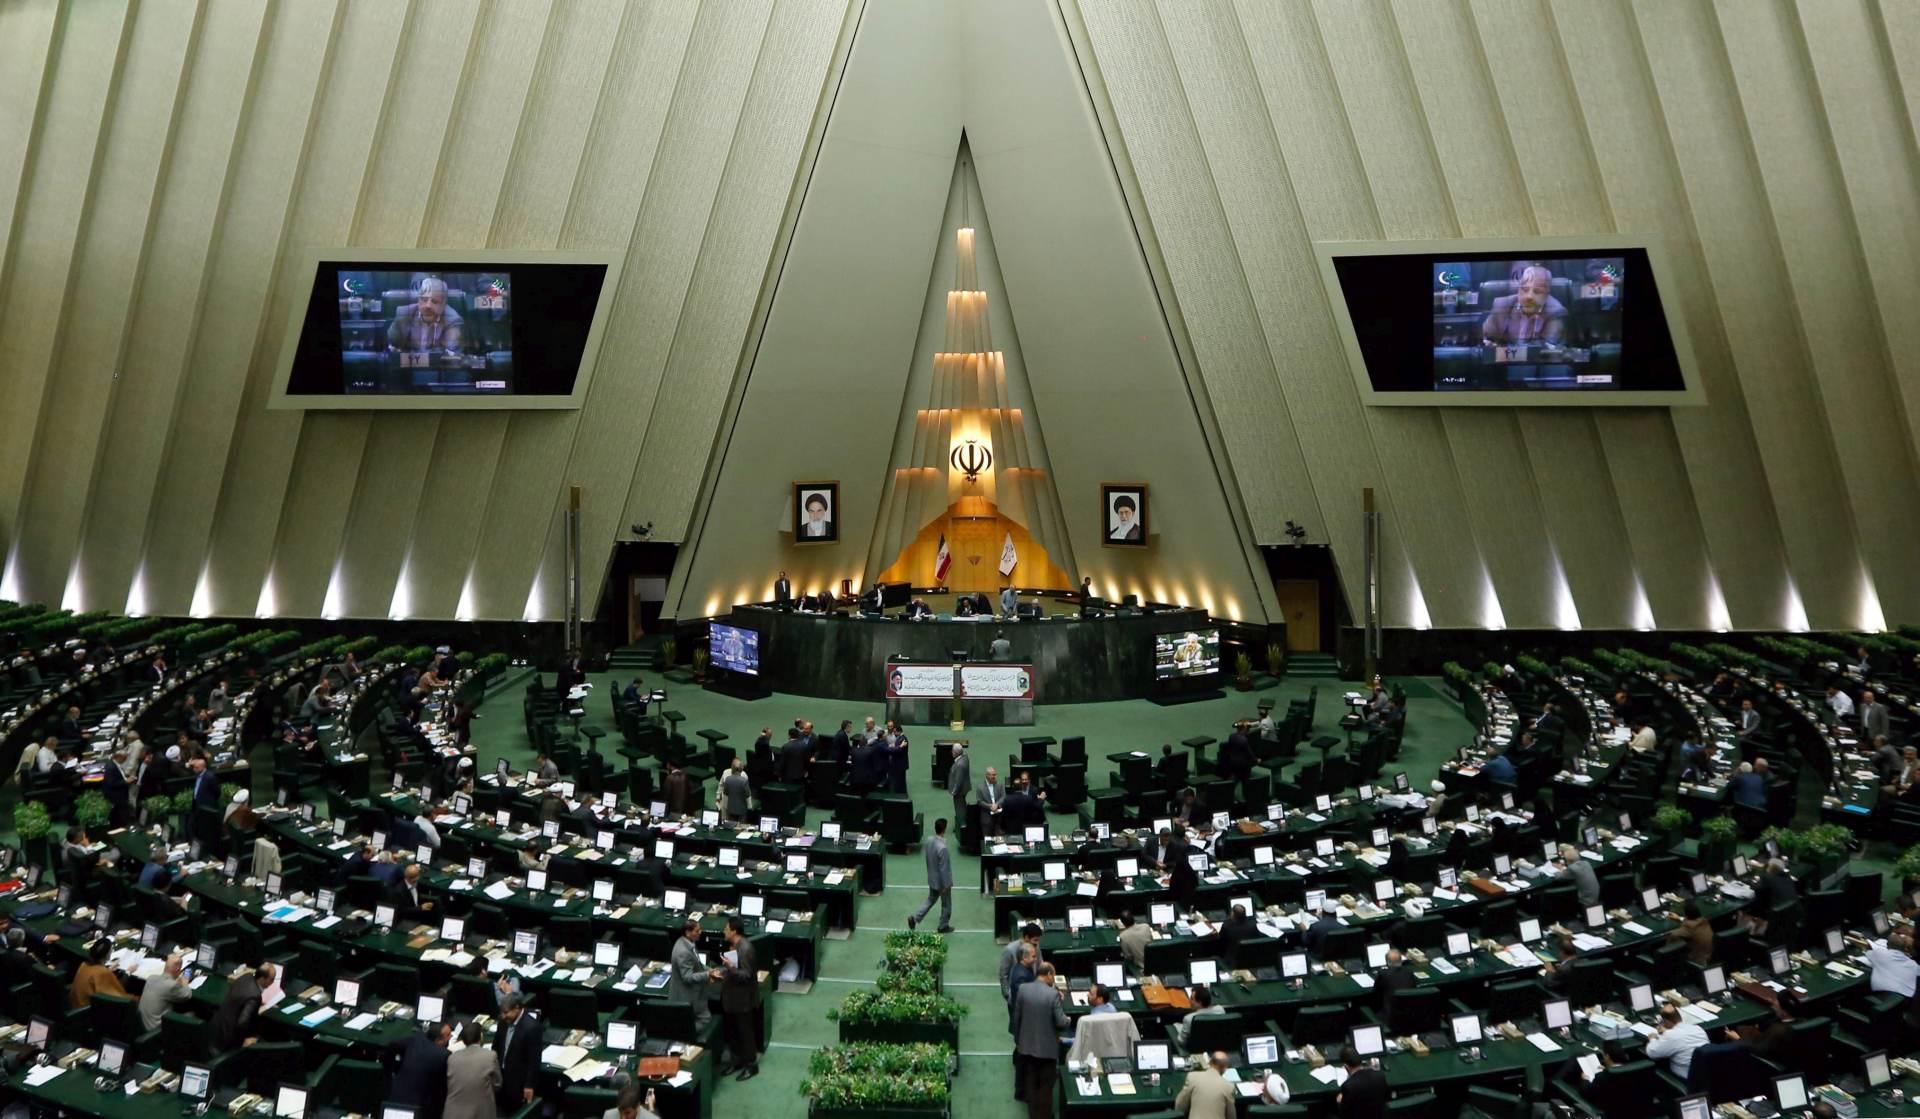 OTEŽANO SKLAPANJE DOGOVORA: Iranski parlament zabranio ključne ustupke u pregovorima s velesilama